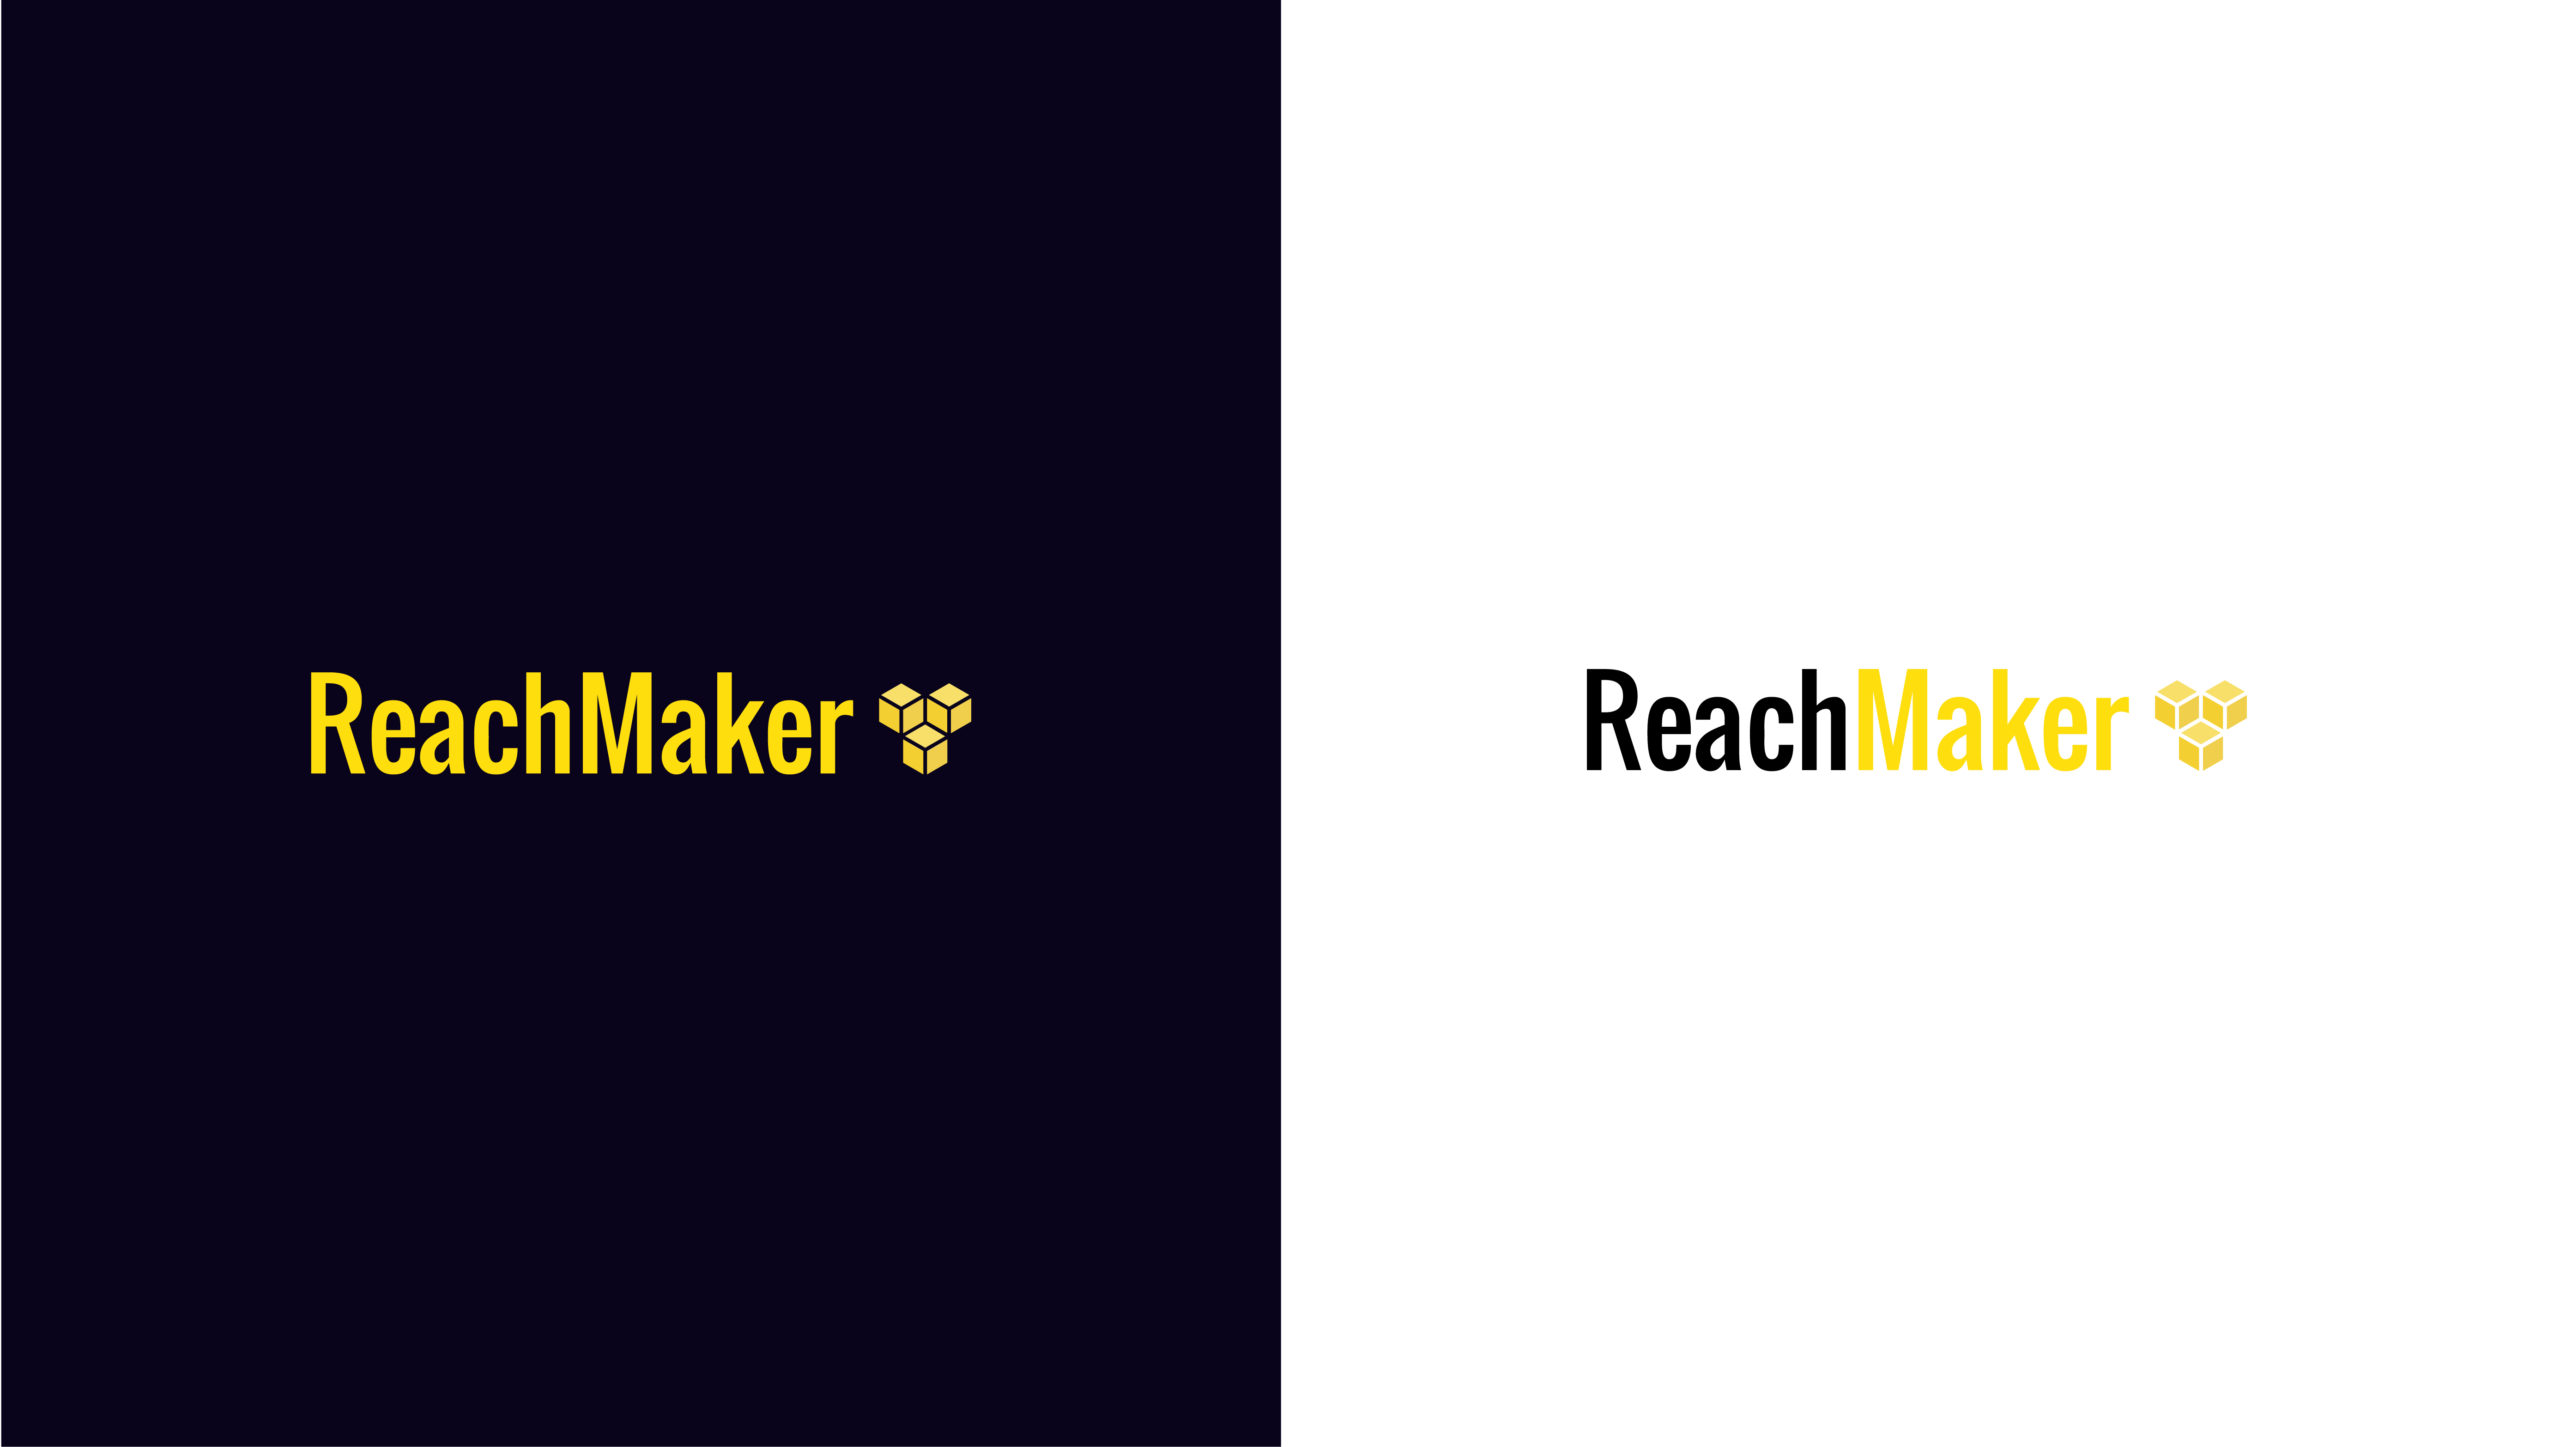 Mise_en_page_ReachMaker 3